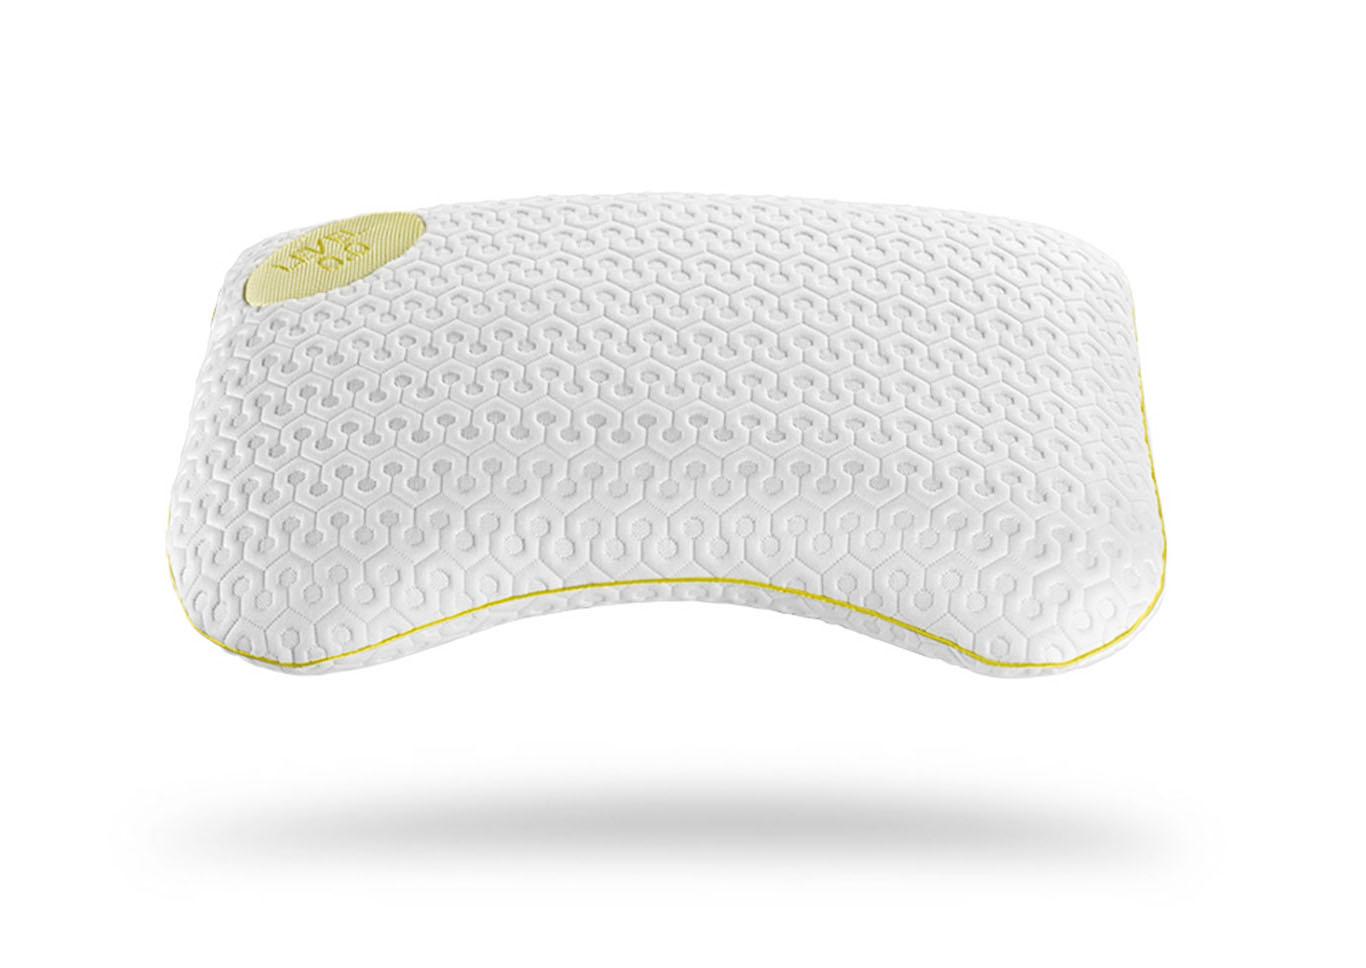 level 0 0 stomach sleeper pillow ivan smith